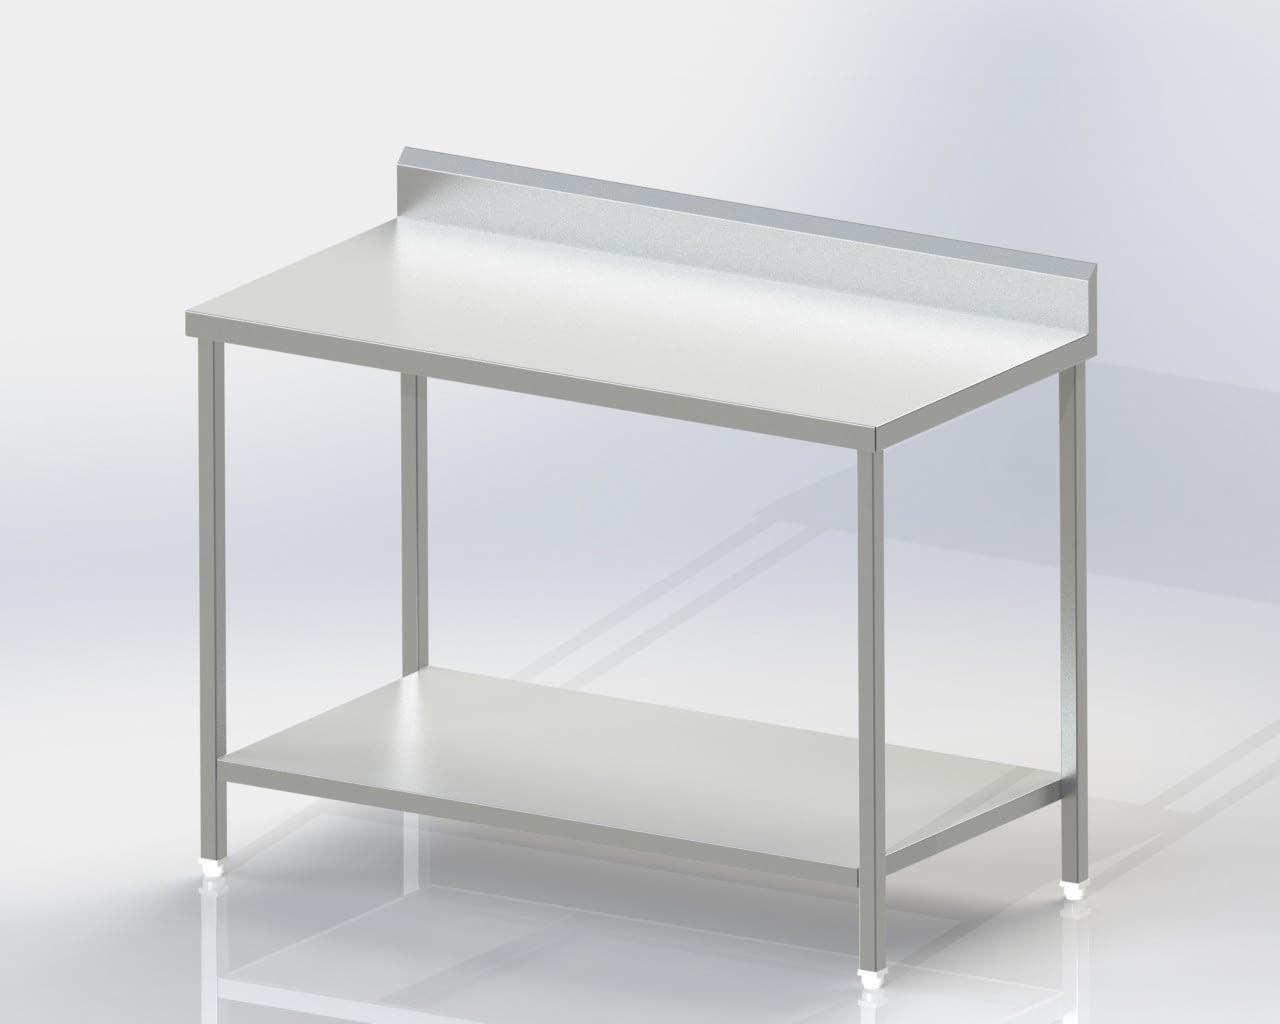 Work Table/Under Shelf with backsplash